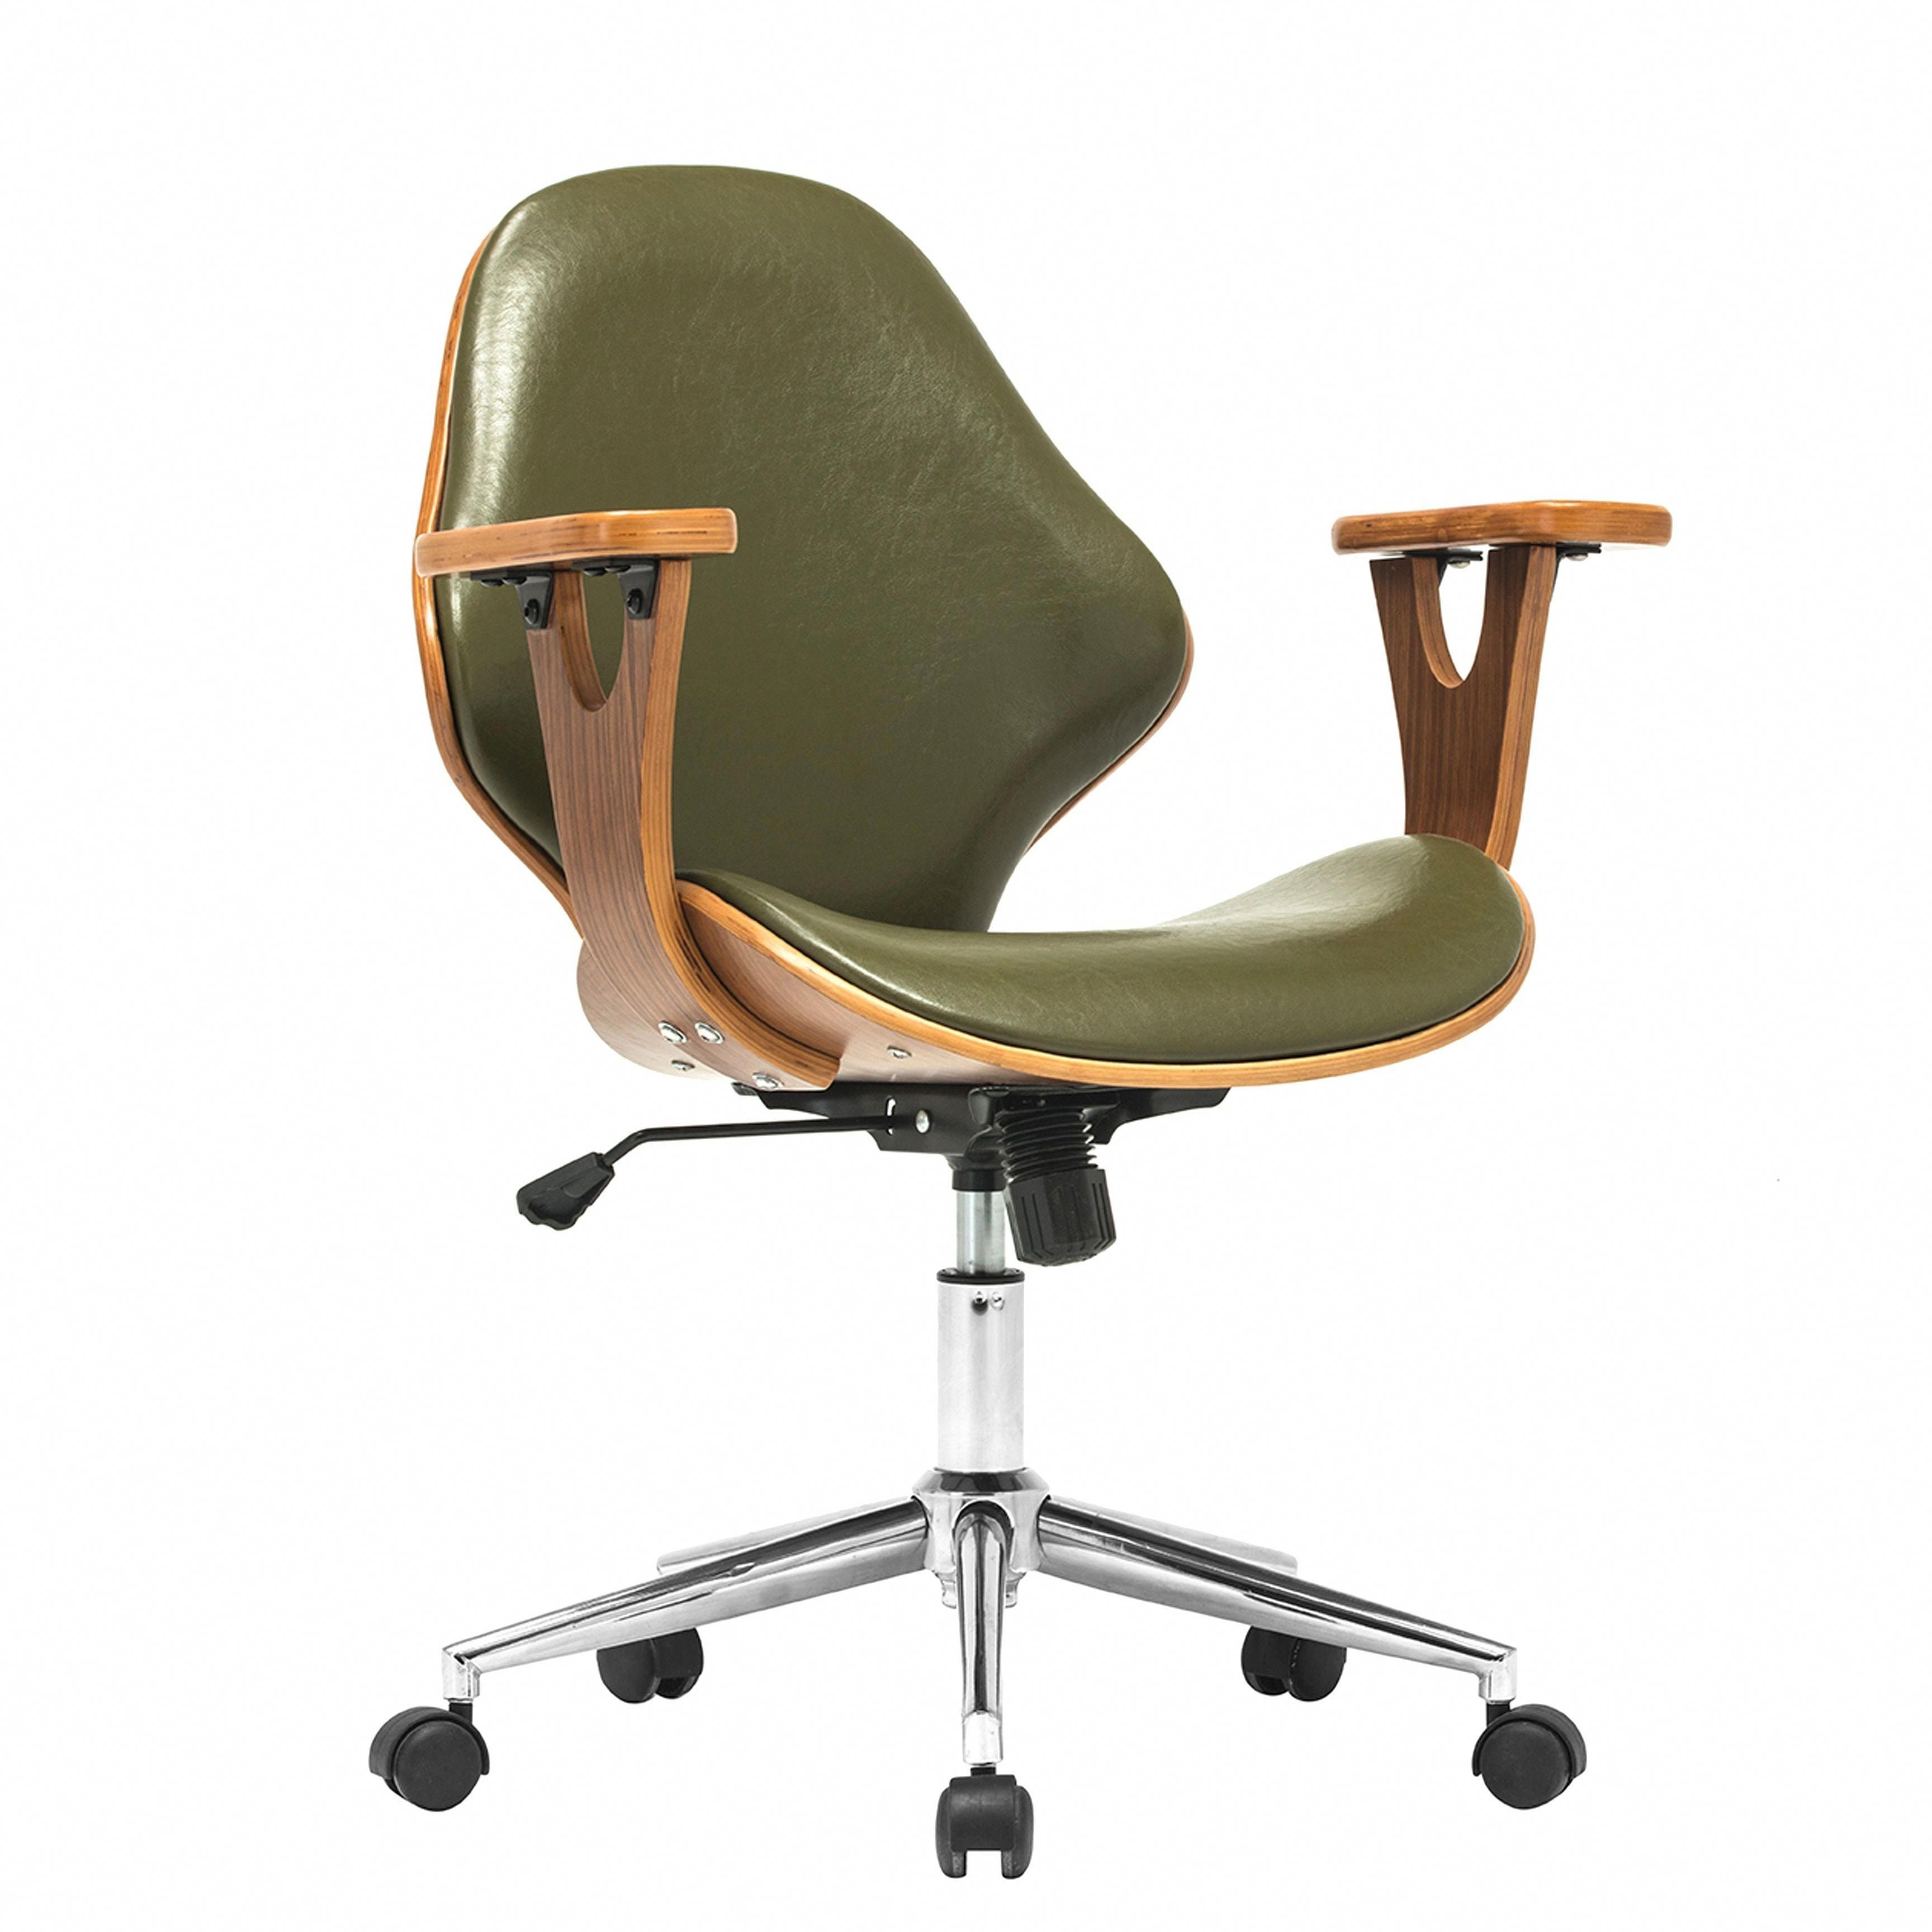 Big Comfy Oversized Chairs Fashiontrendsforteens Chairandahalf